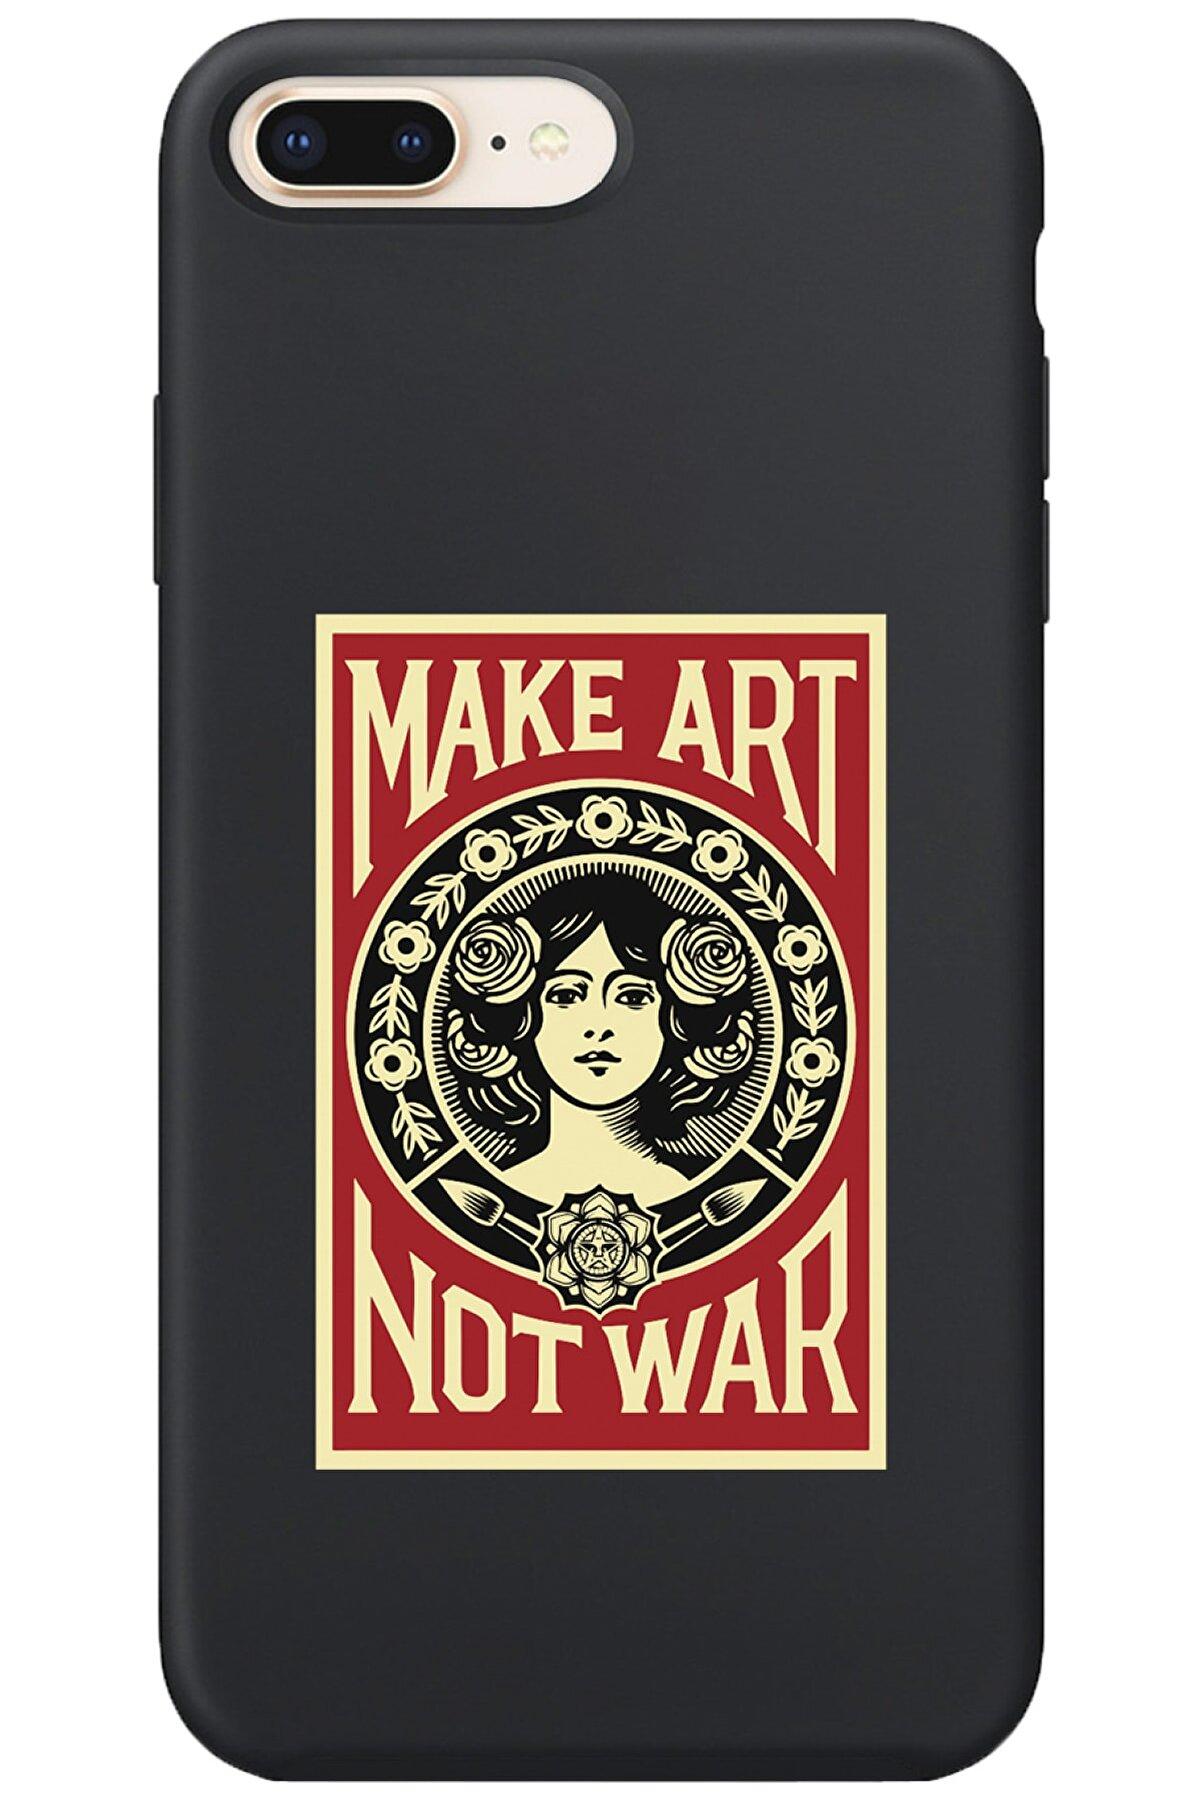 shoptocase Iphone 7 Plus Lansman Make Art Desenli Telefon Kılıfı